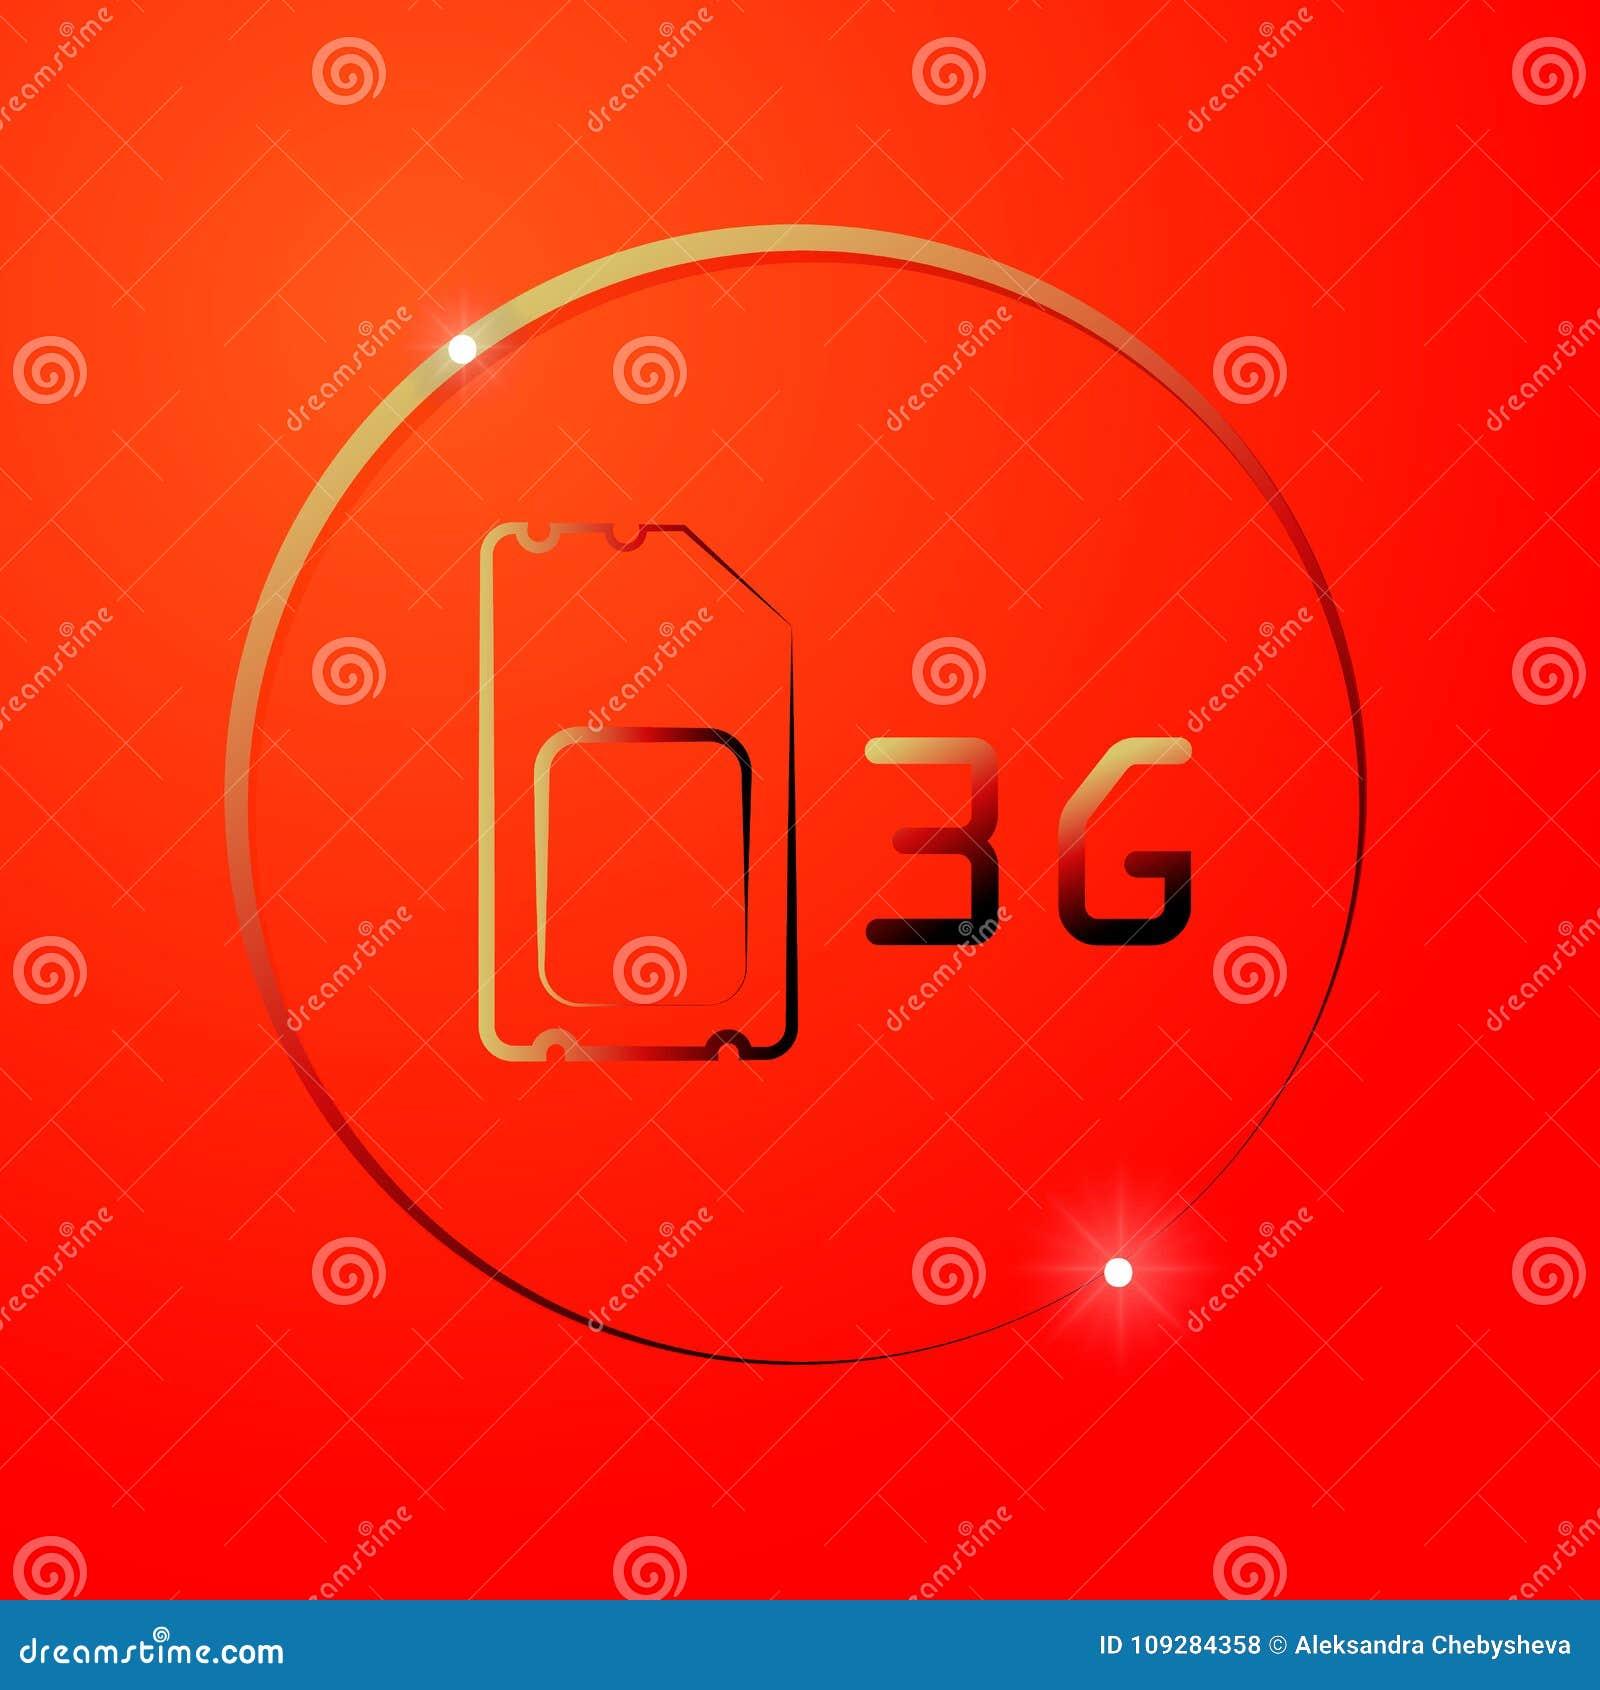 3G Sim Card  Mobile Telecommunications Technology Symbol